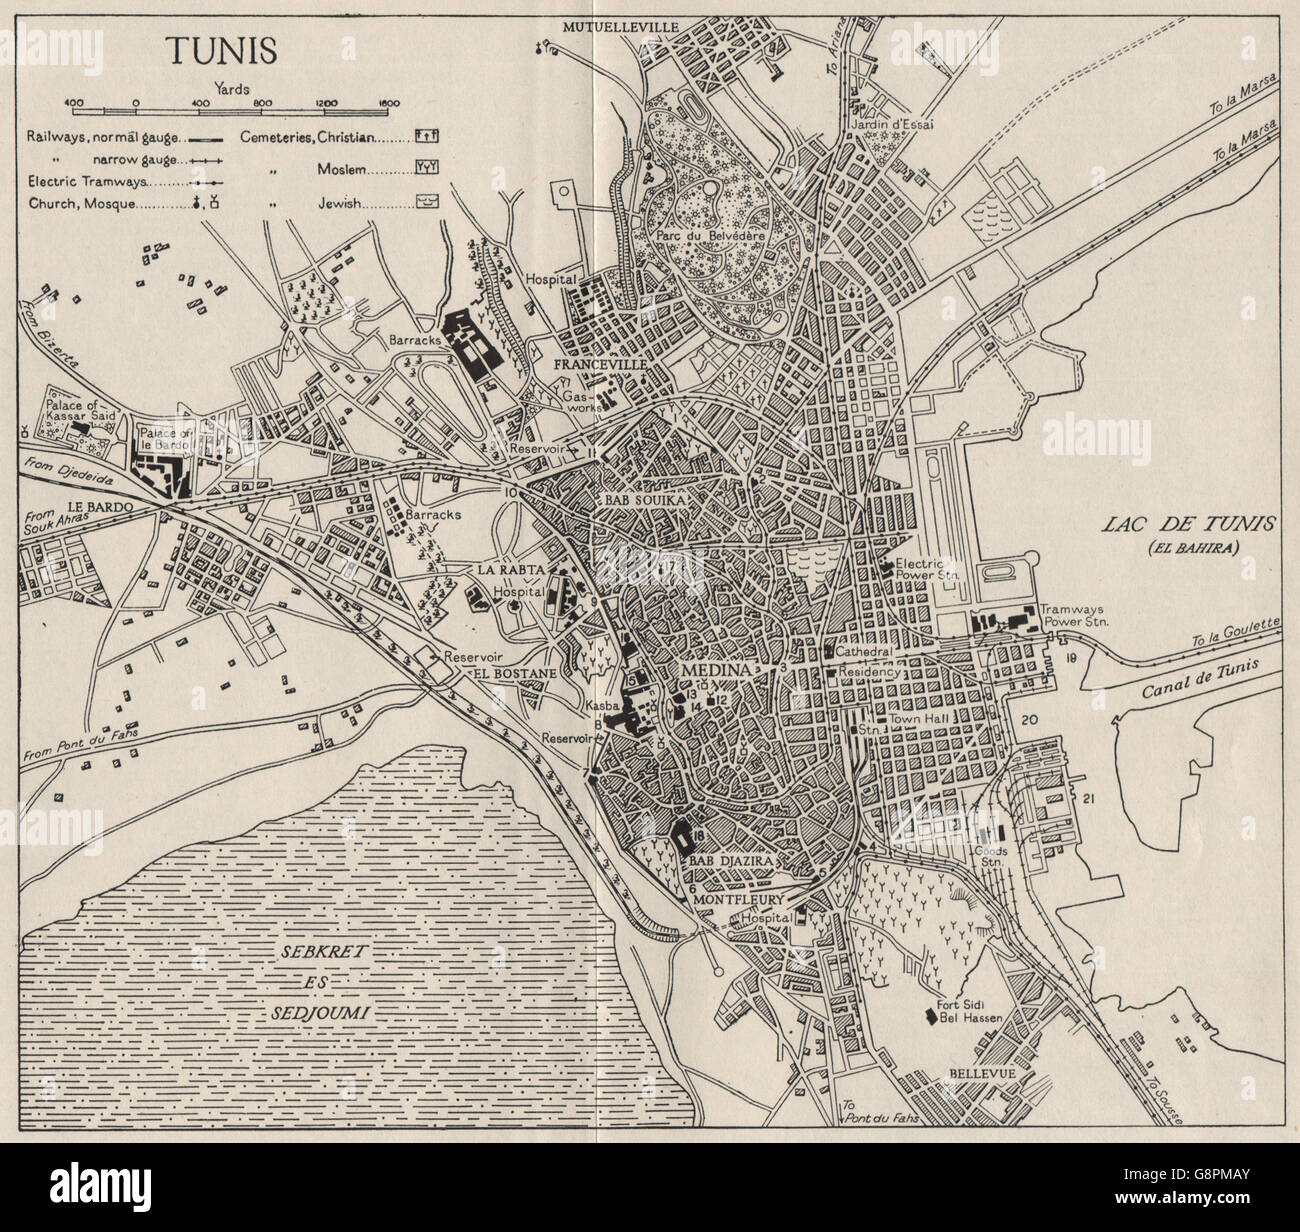 TUNIS: Town Plan. Tunisia. WW2 ROYAL NAVY INTELLIGENCE MAP